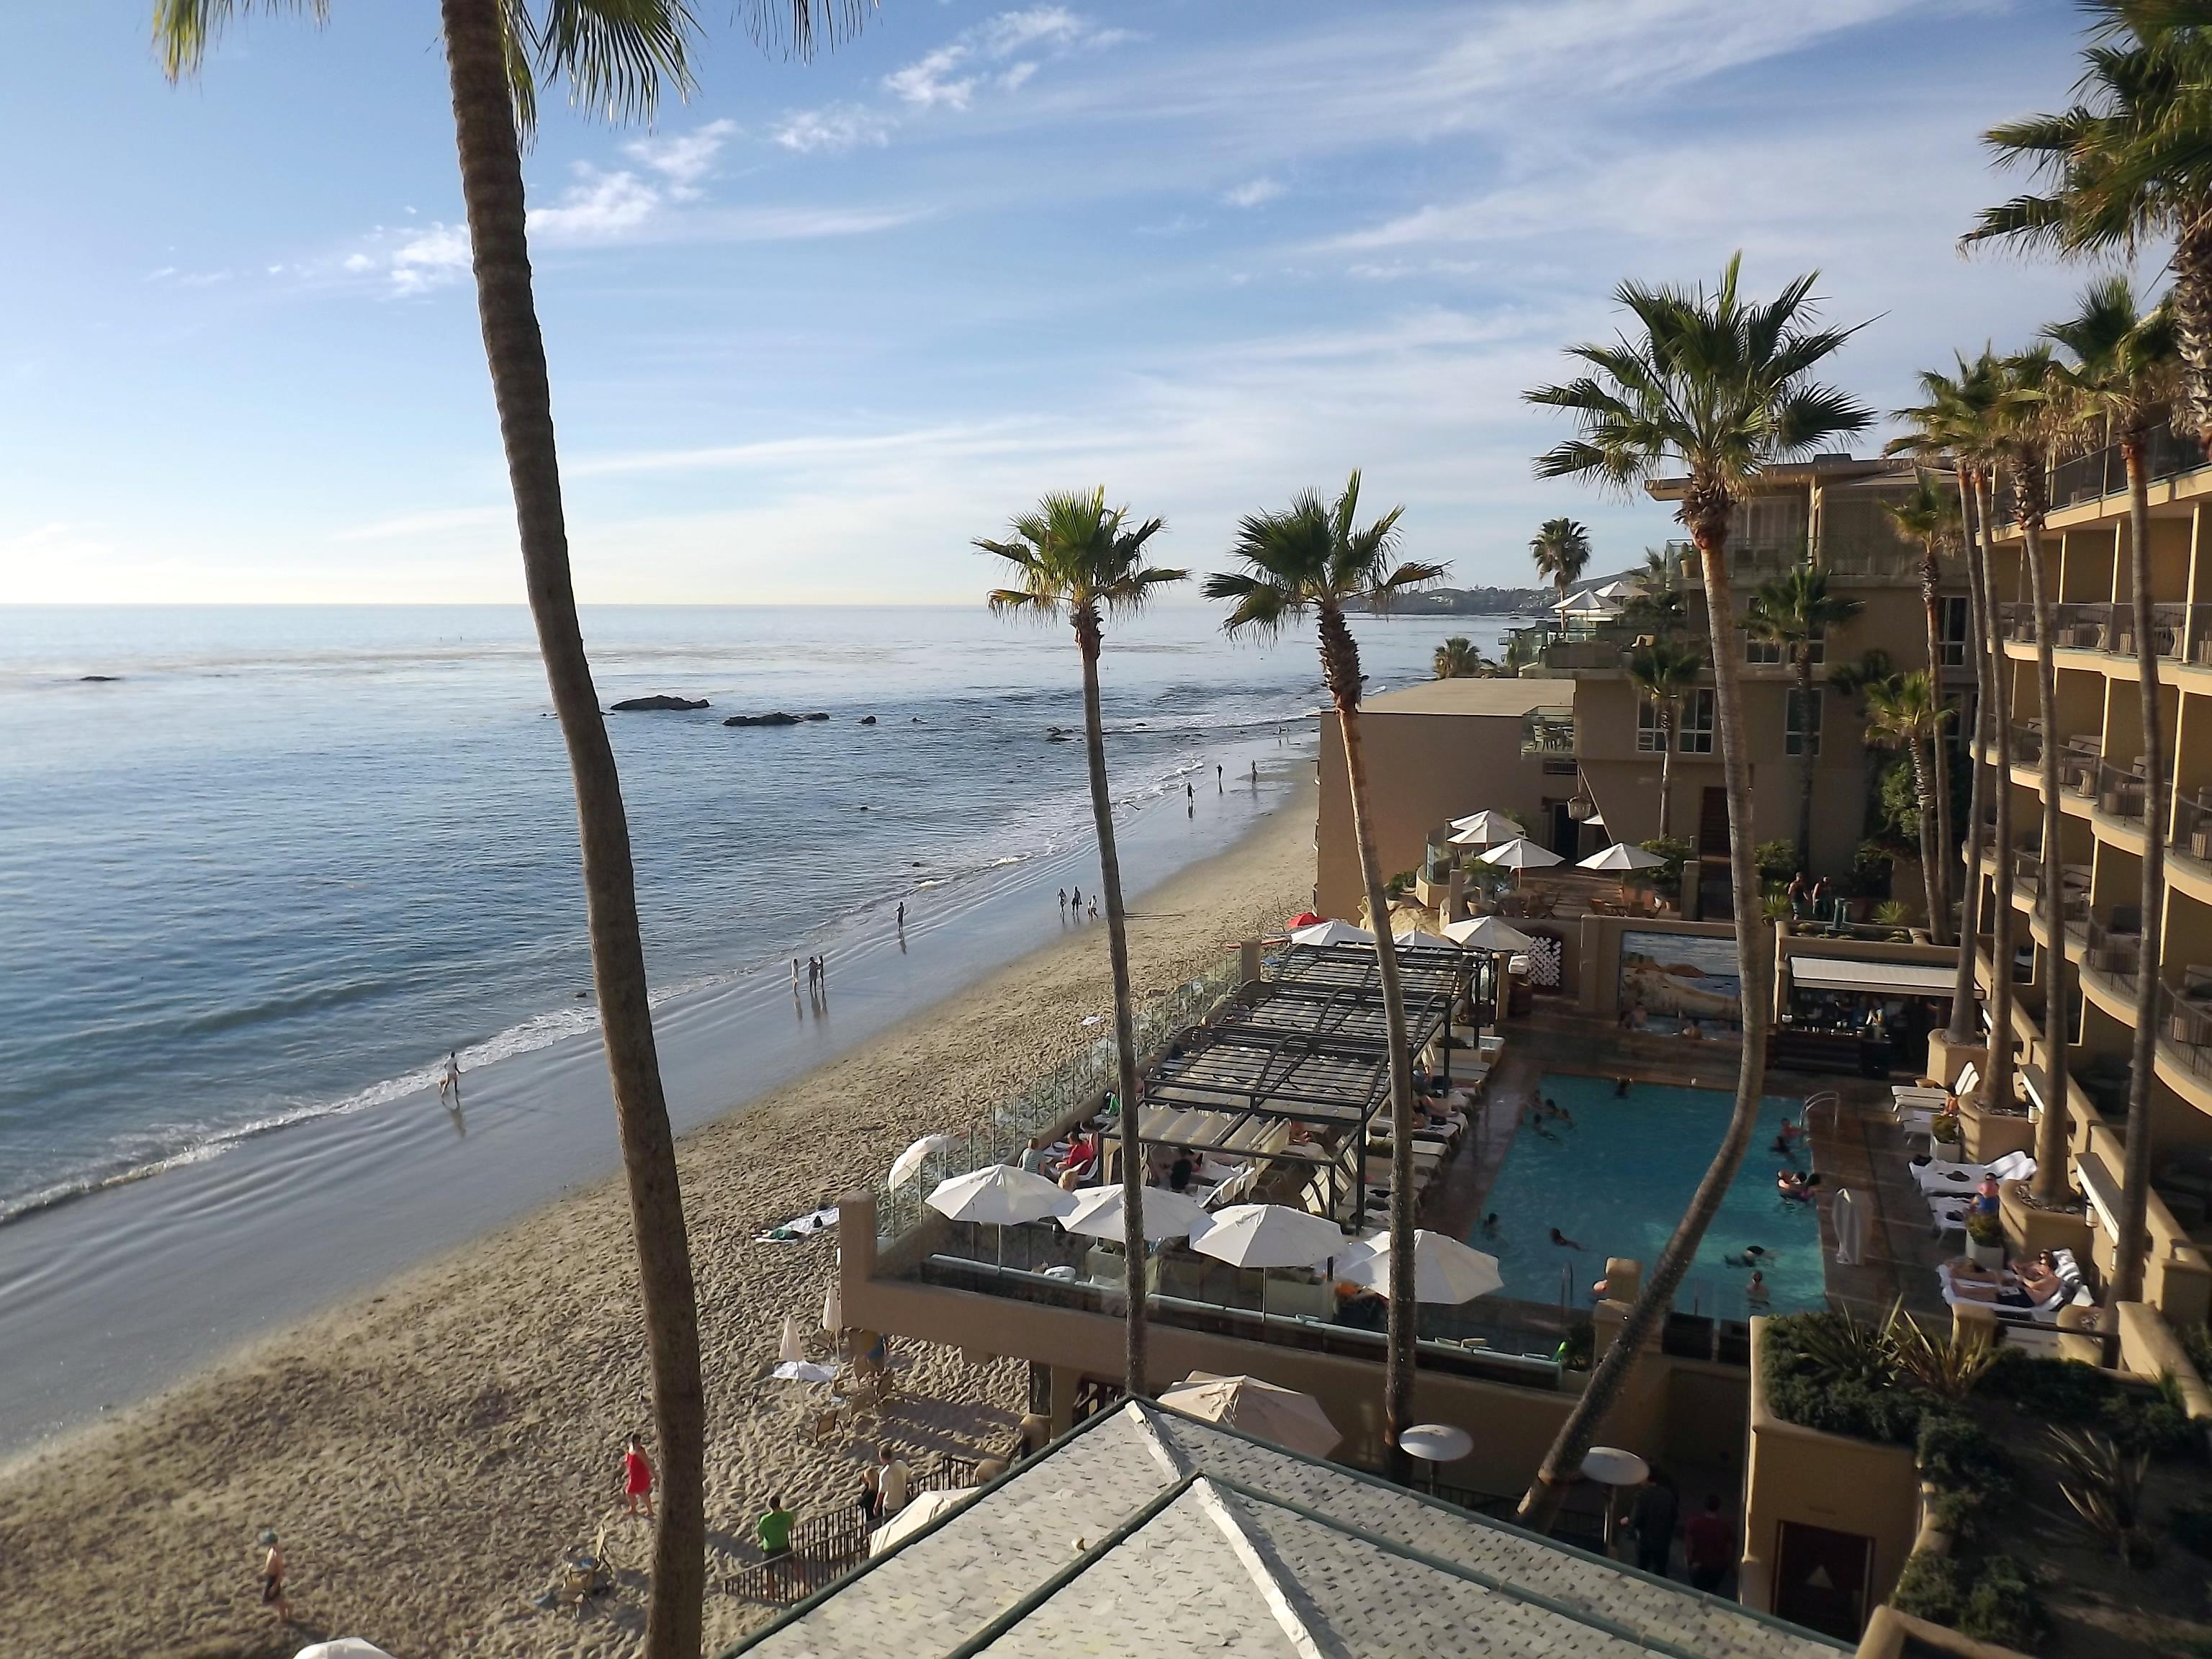 Laguna Niguel Birthday Party Shaken Not Stirred in LA